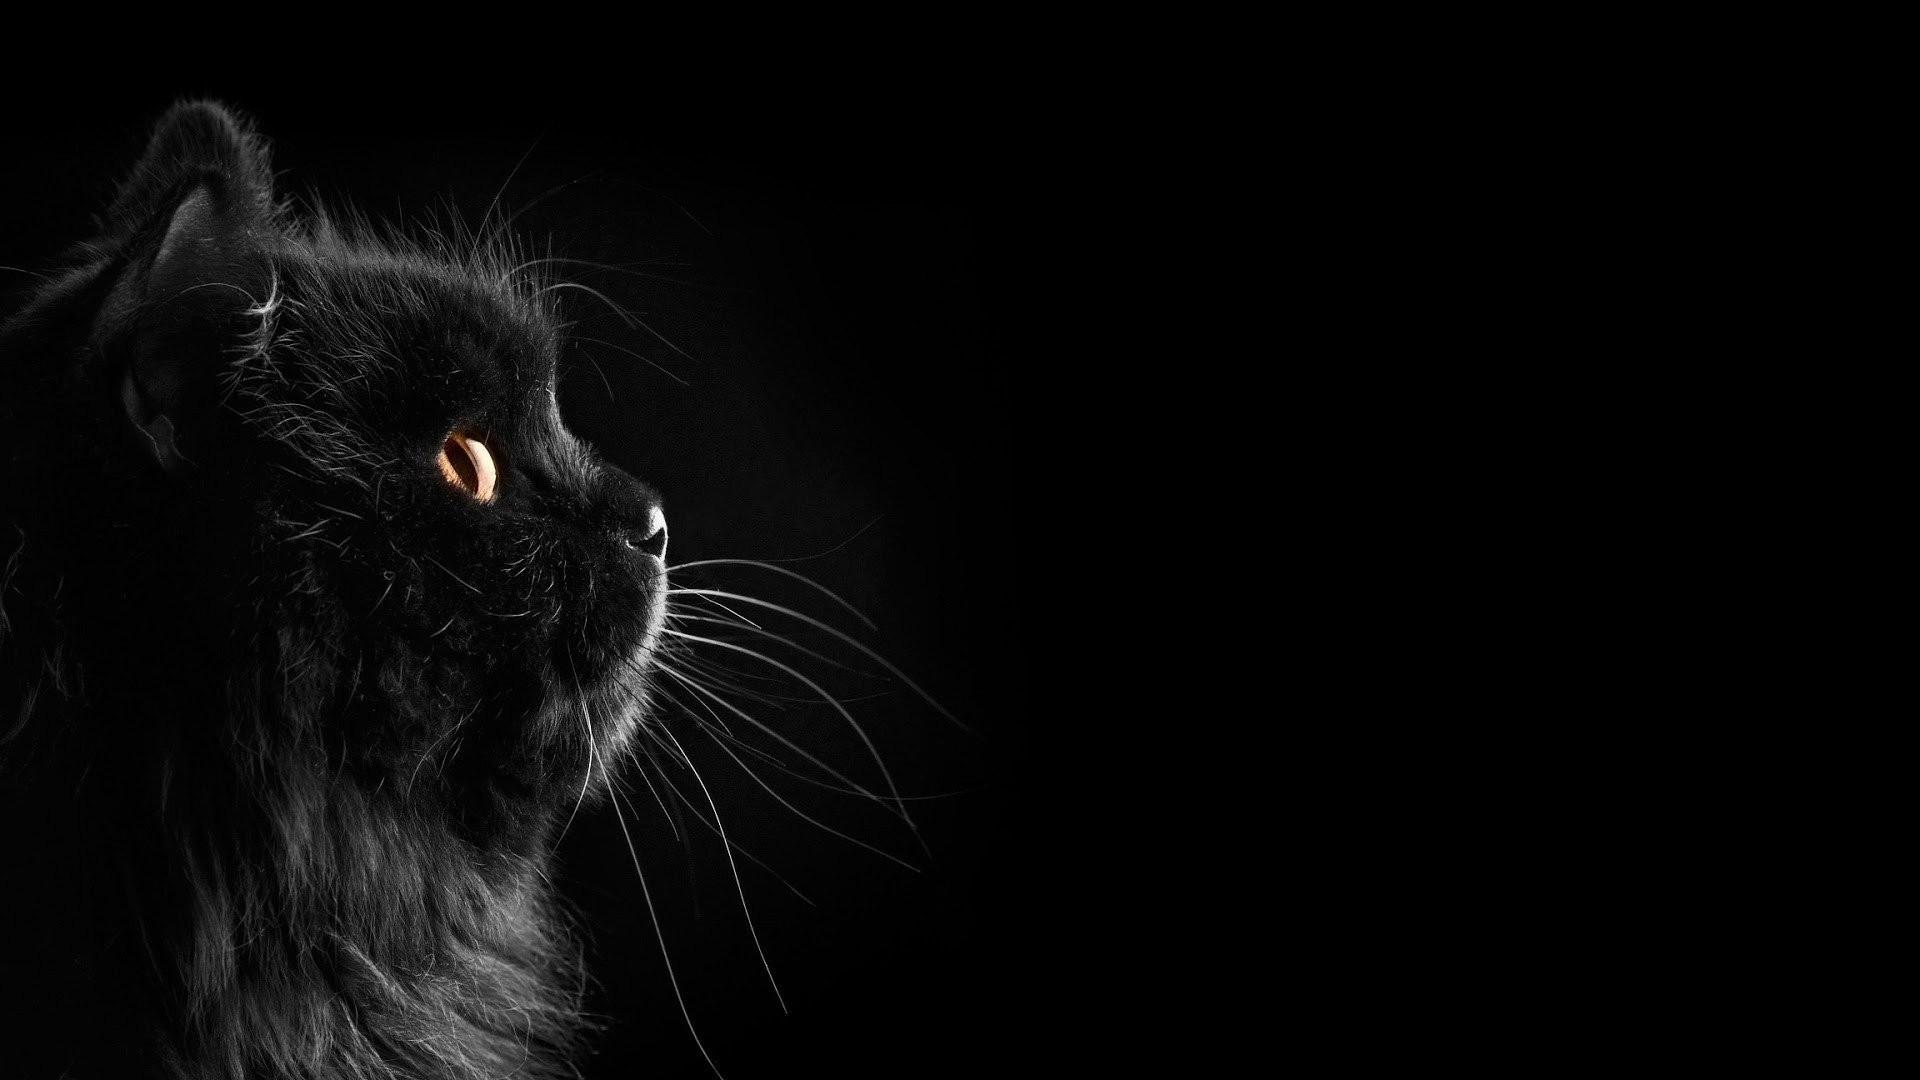 Cute Black Desktop wallpaper